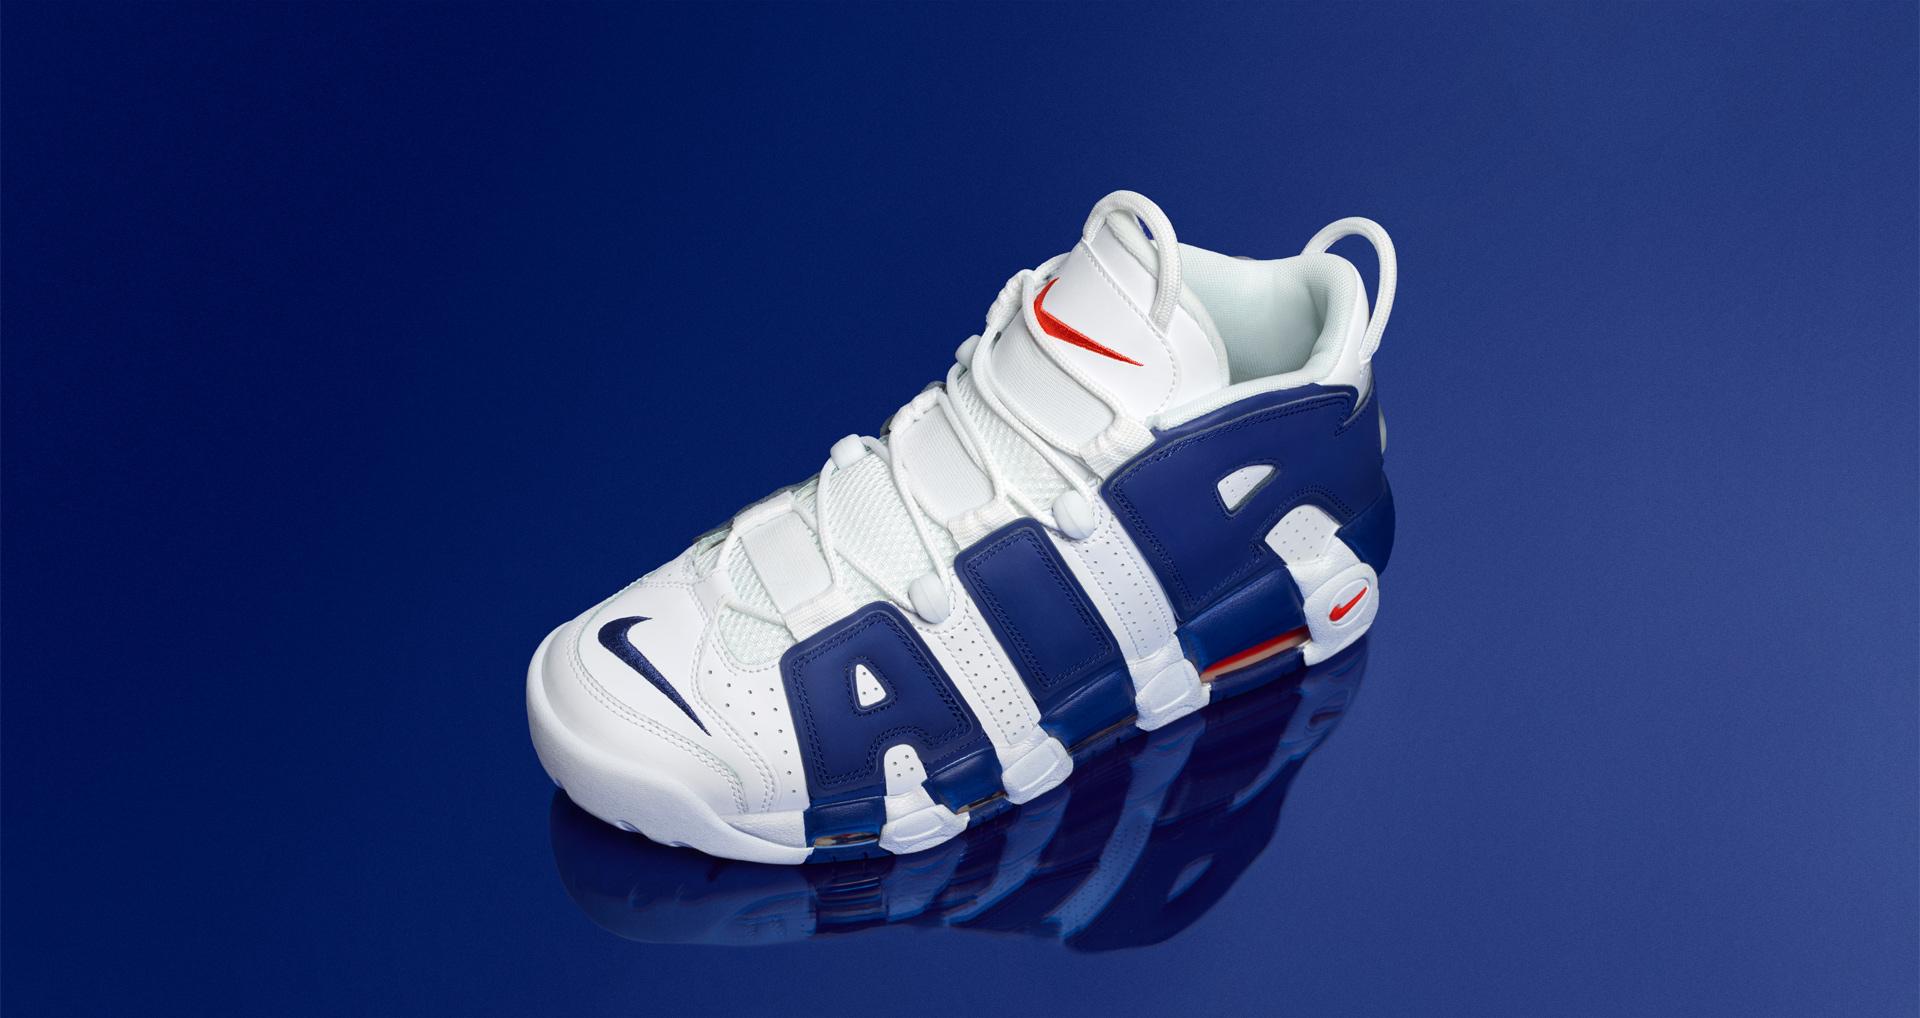 10dbbfc9b62 Nike Air More Uptempo 96 Knicks / Consortium